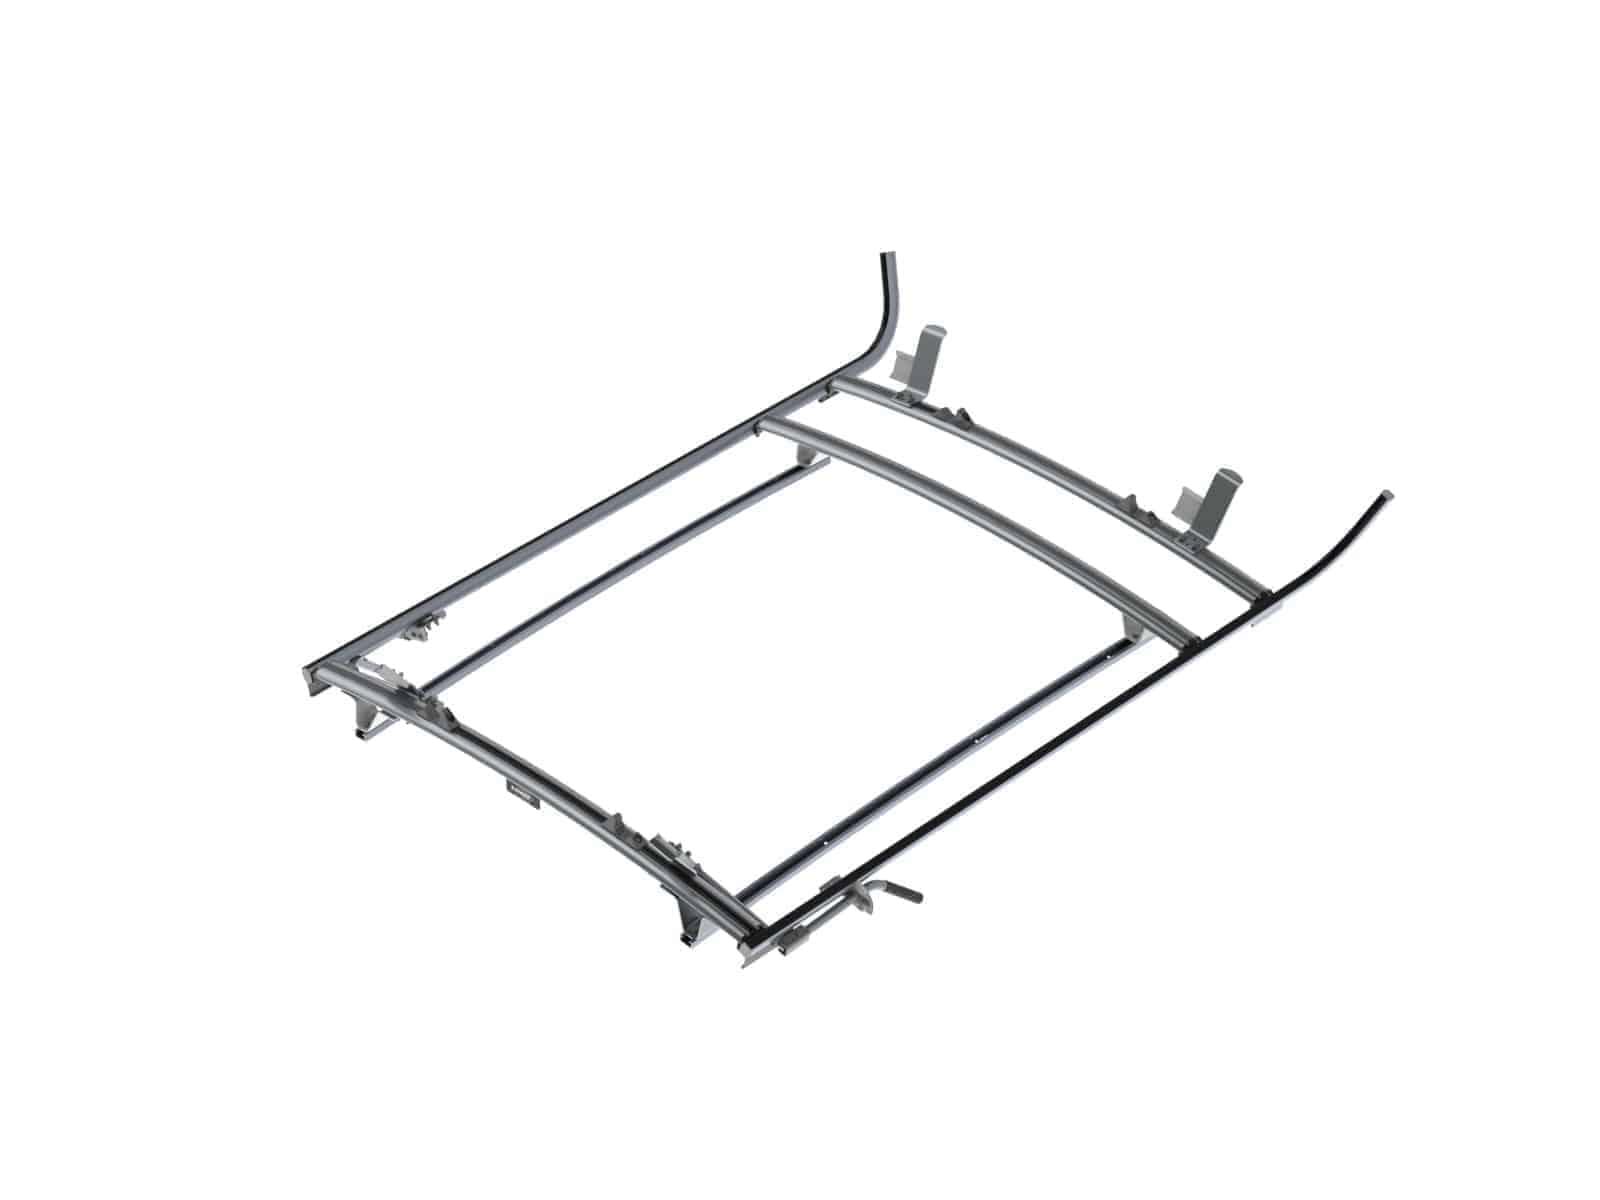 Double Side Transit Connect Ladder Rack 3 Bar System